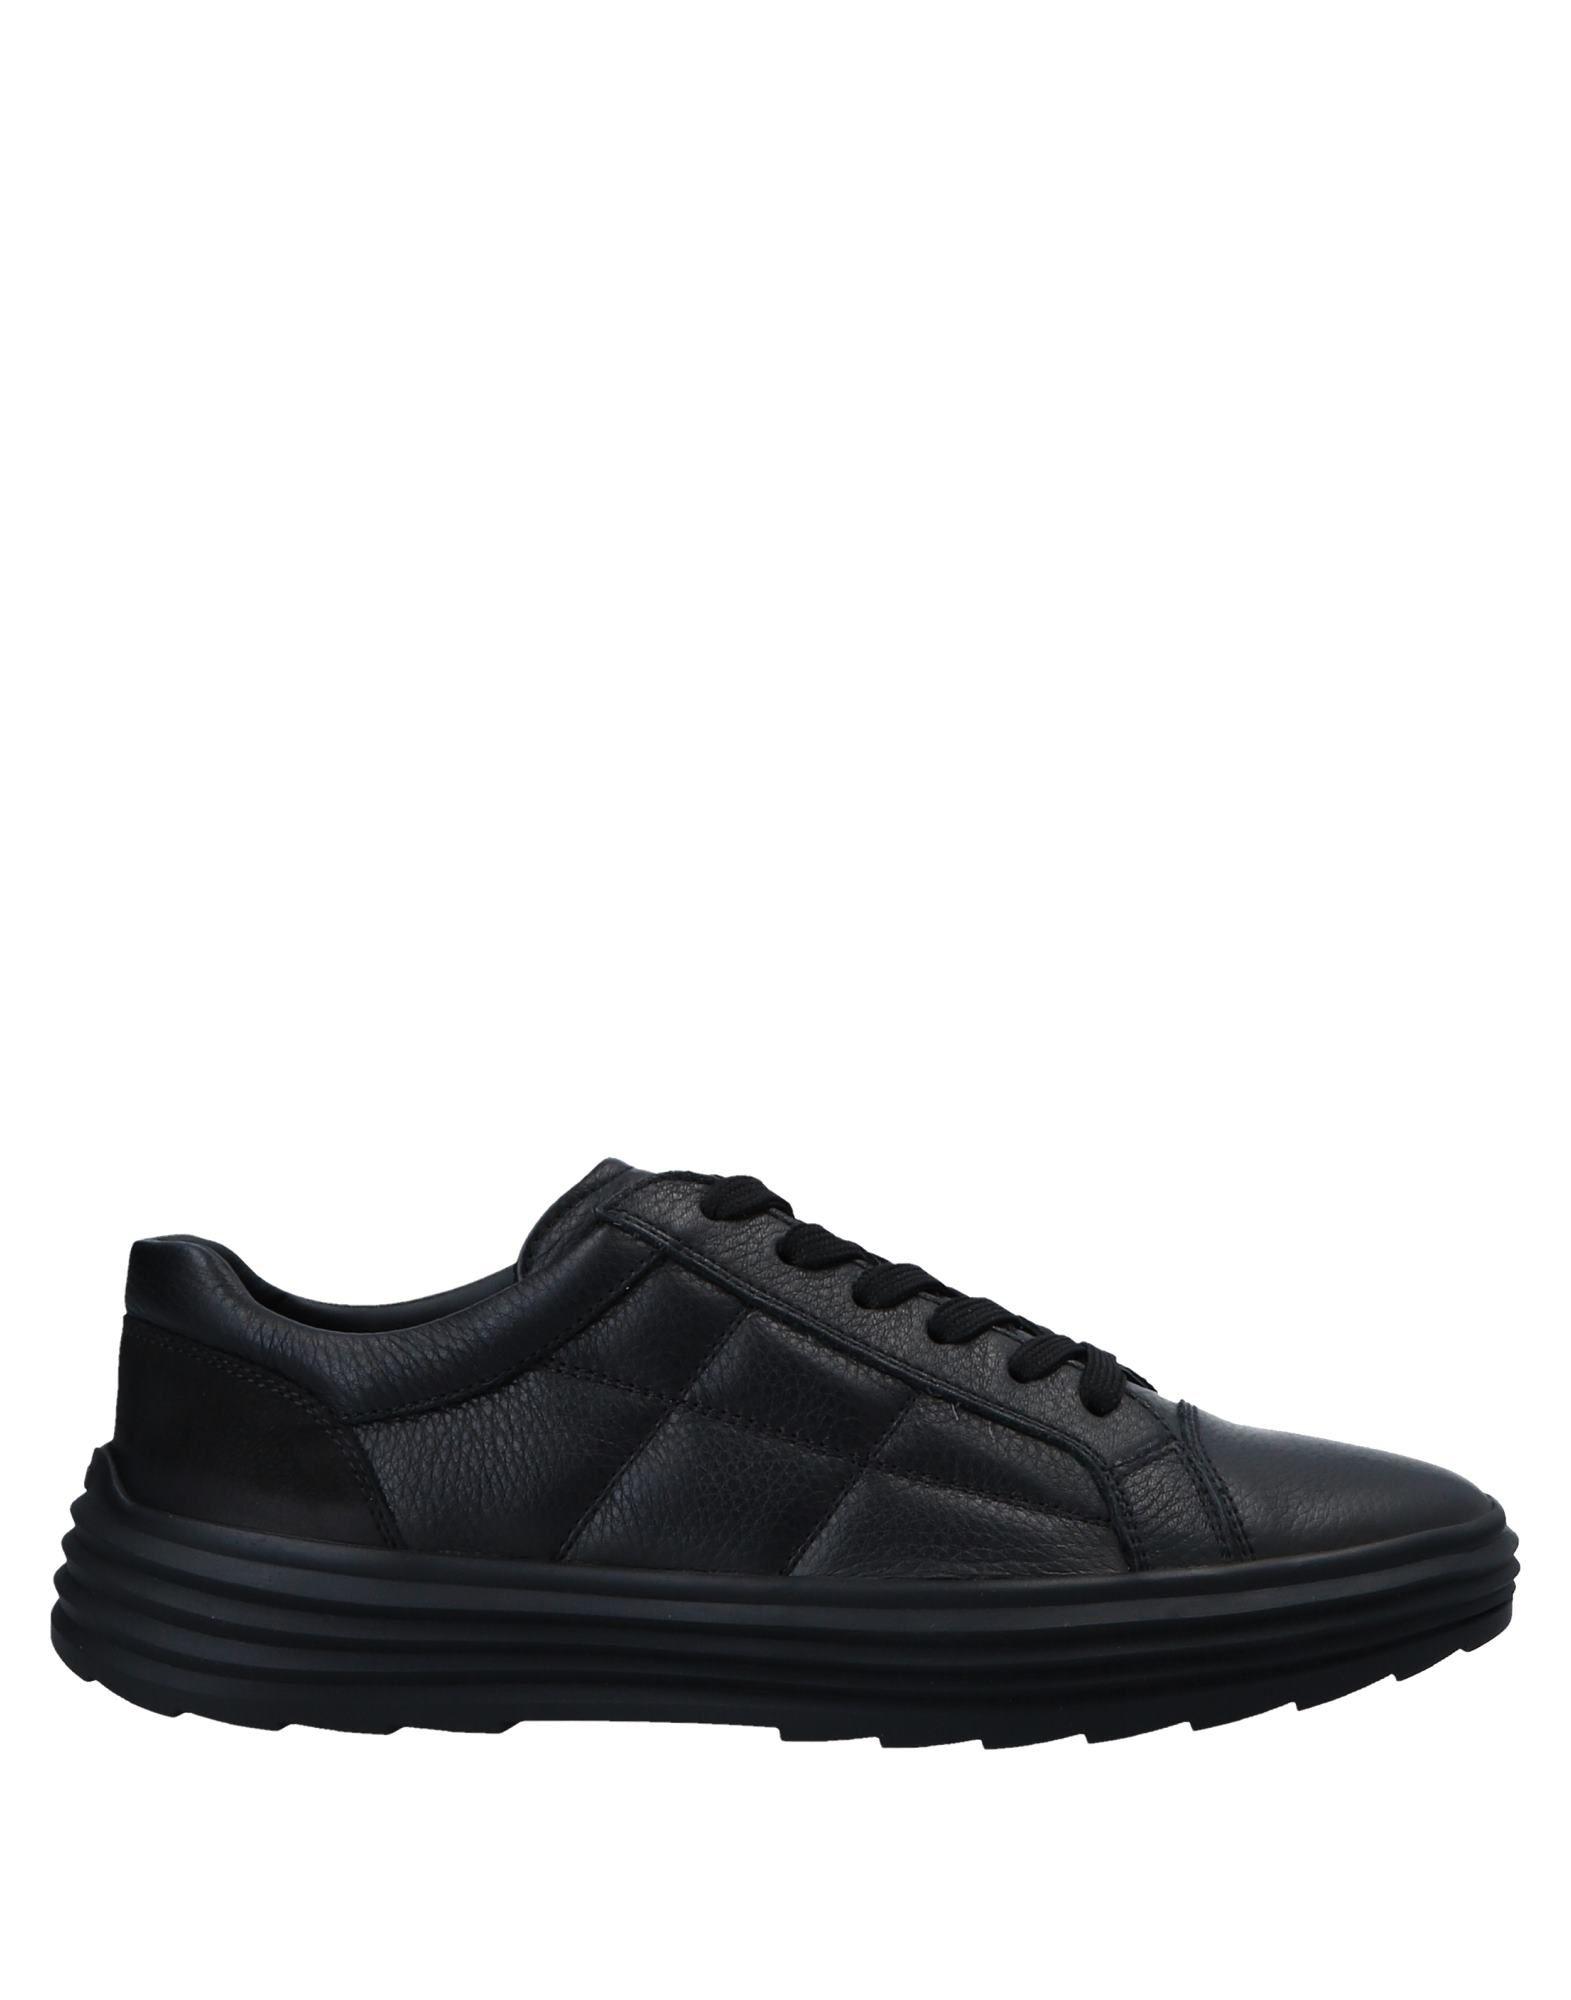 Hogan Sneakers Herren  11560224ID Gute Qualität beliebte Schuhe